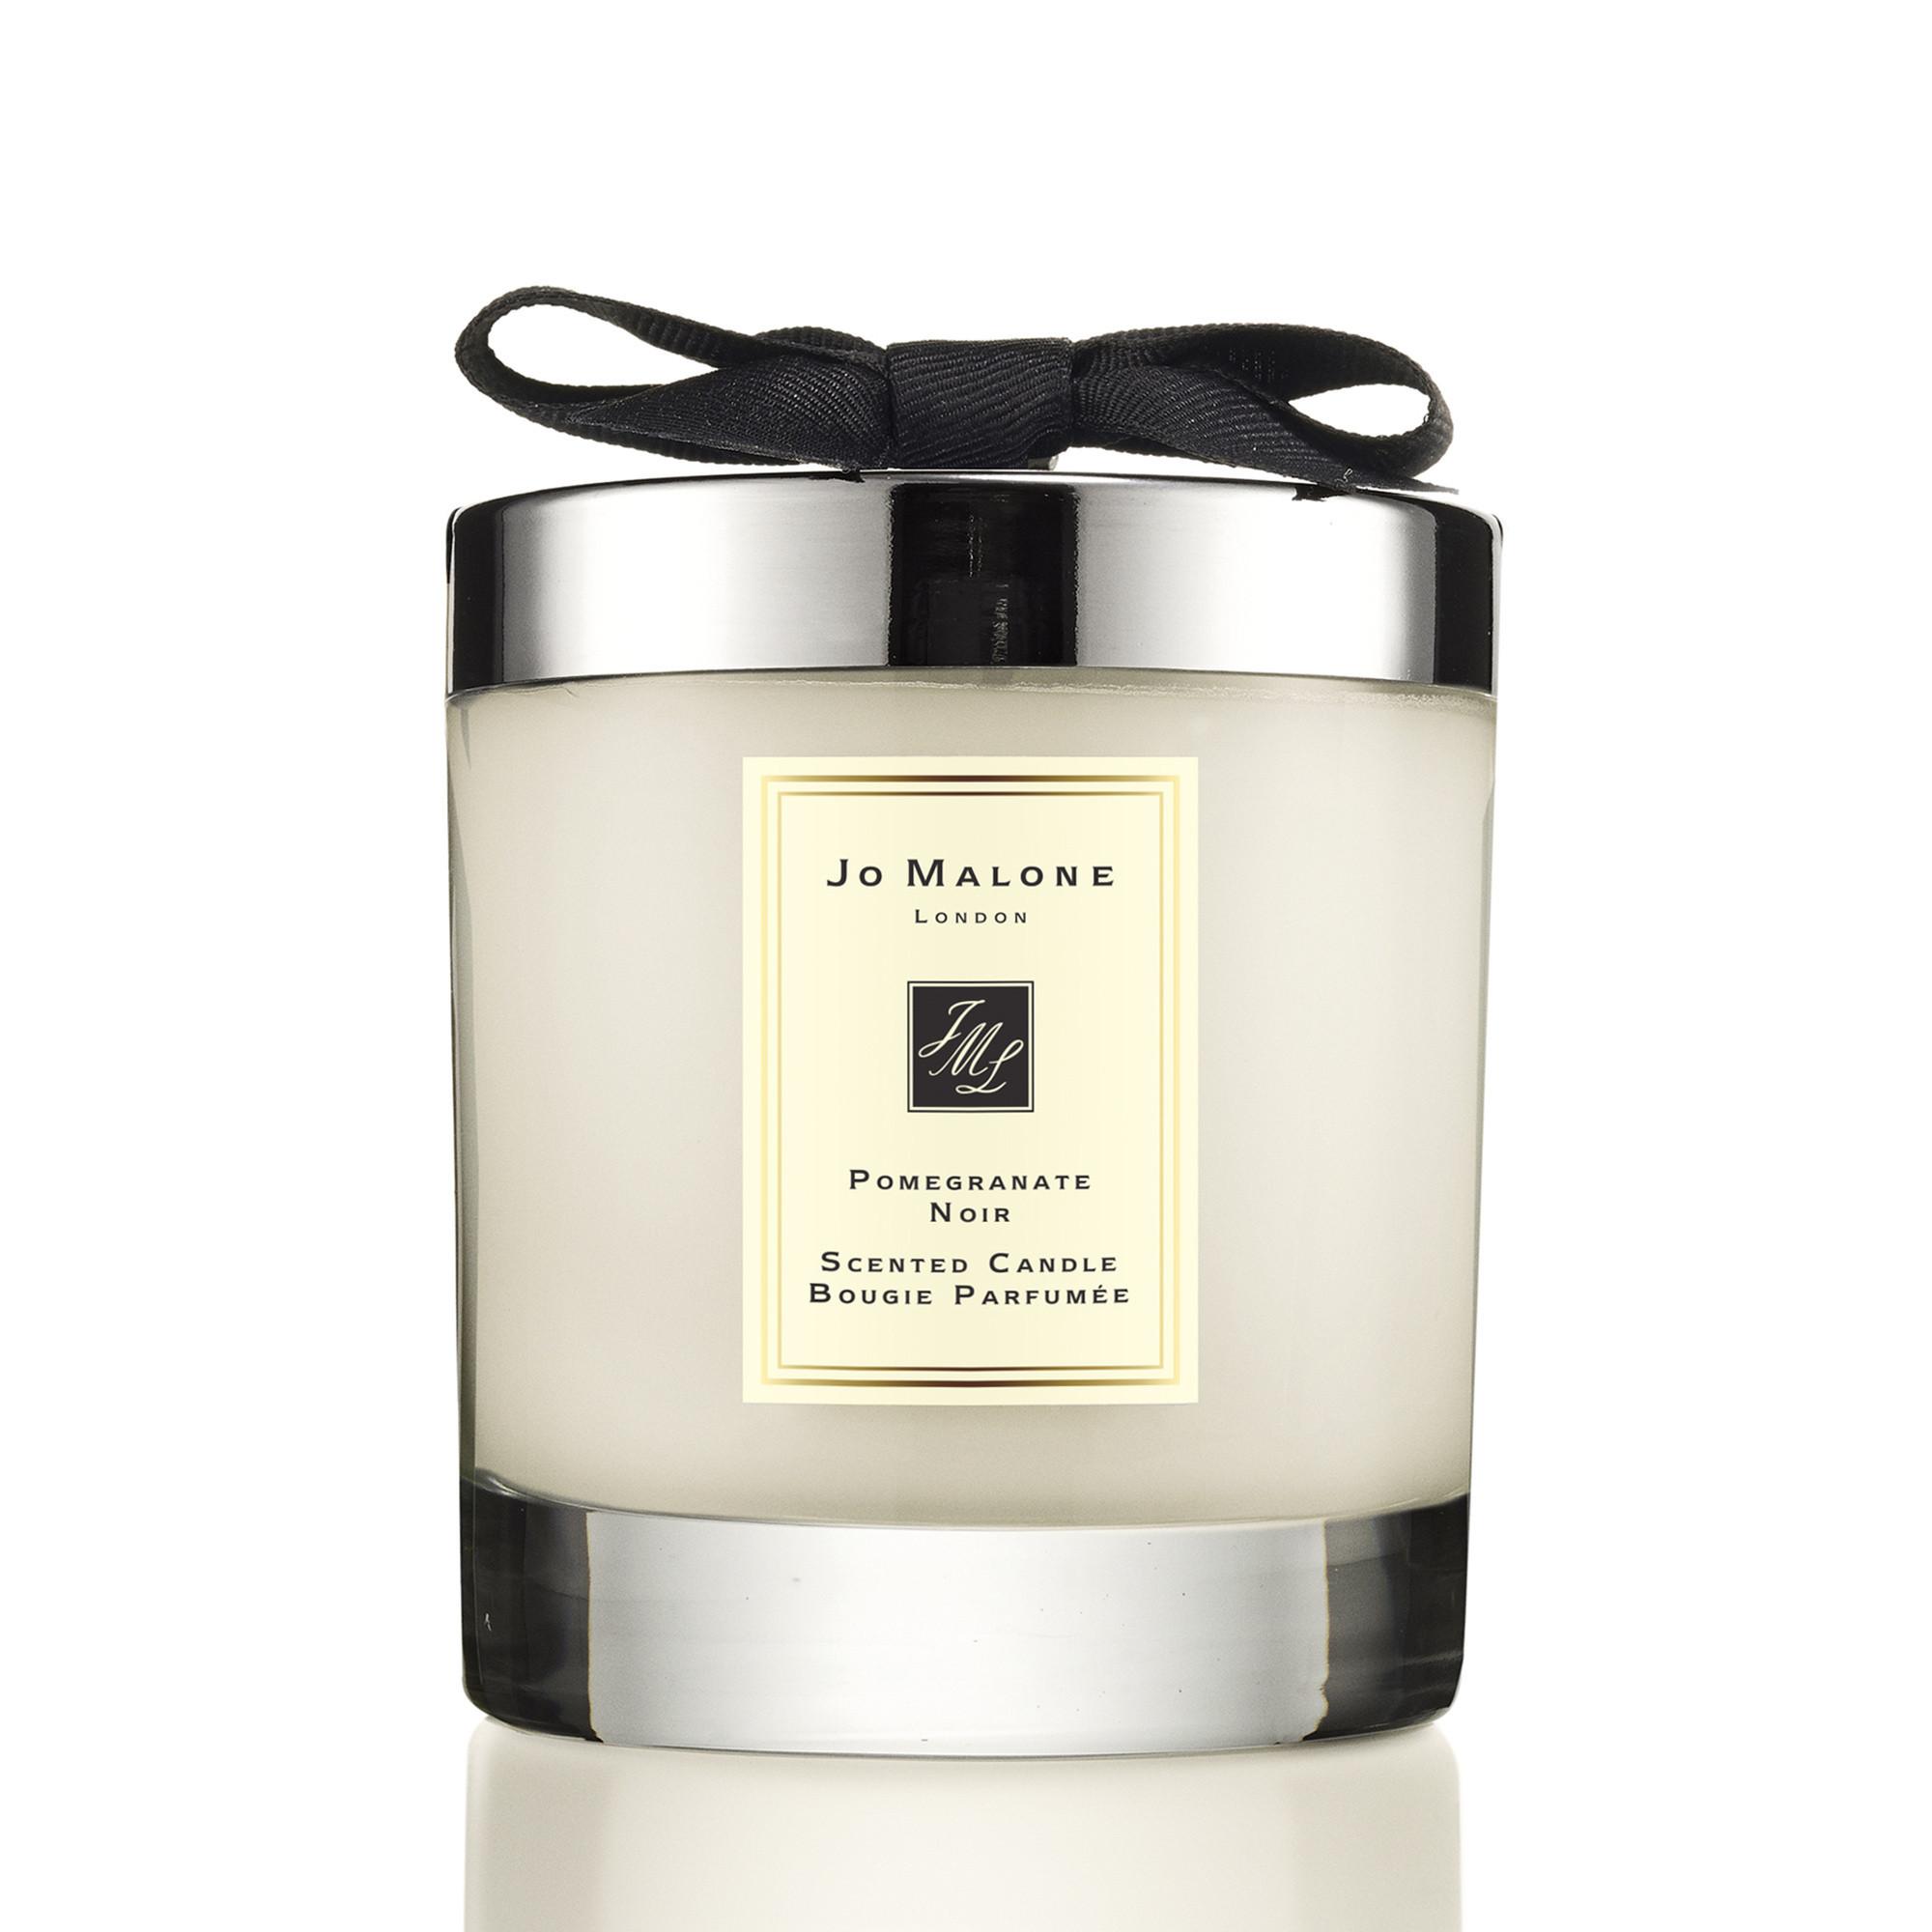 Jo Malone London pomegranate noir home candle 200 g, Nero, large image number 0